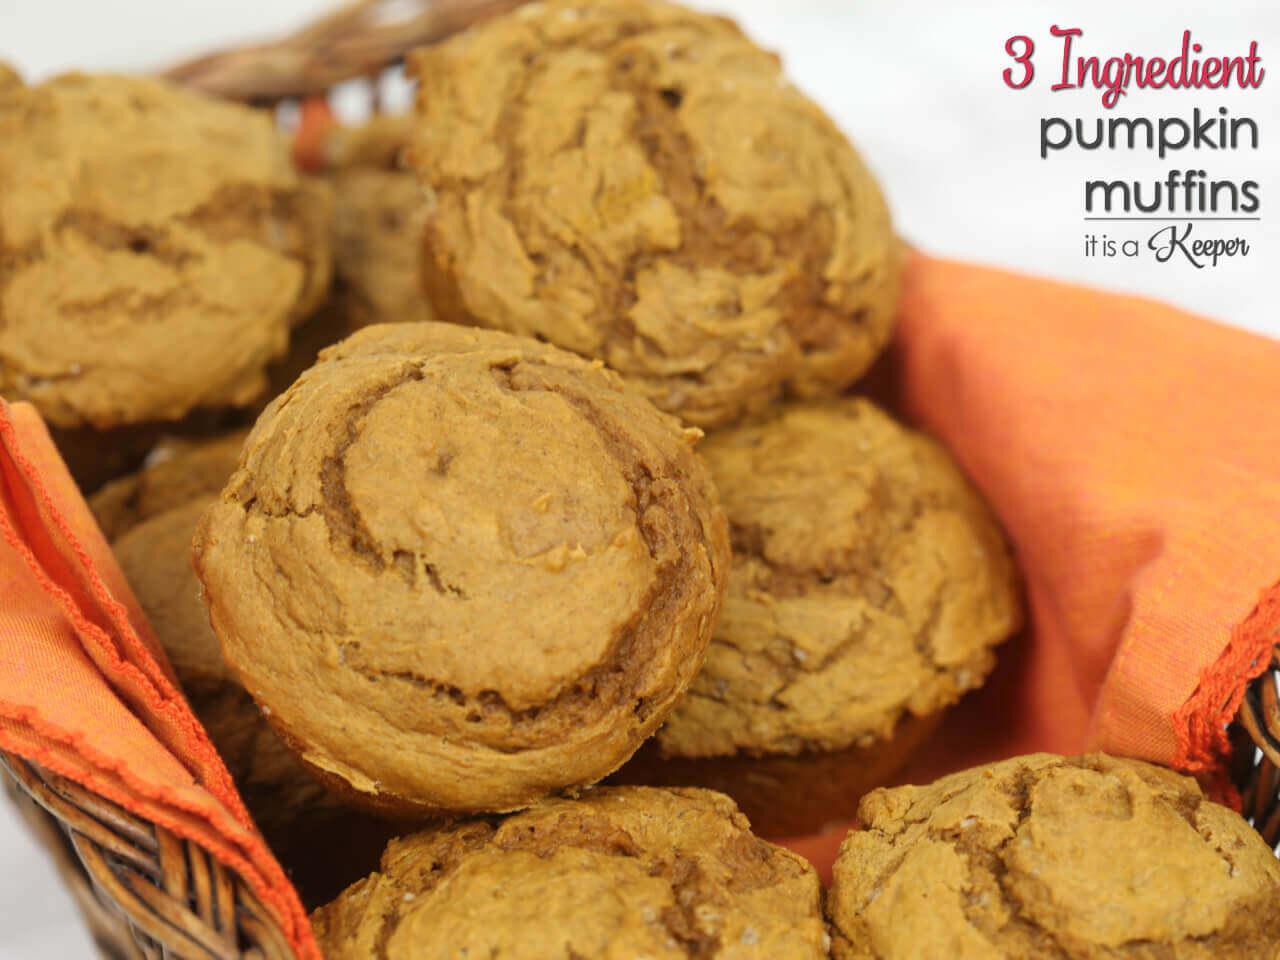 3 Ingredient Pumpkin Muffins - this easy dessert recipe is super simple to make